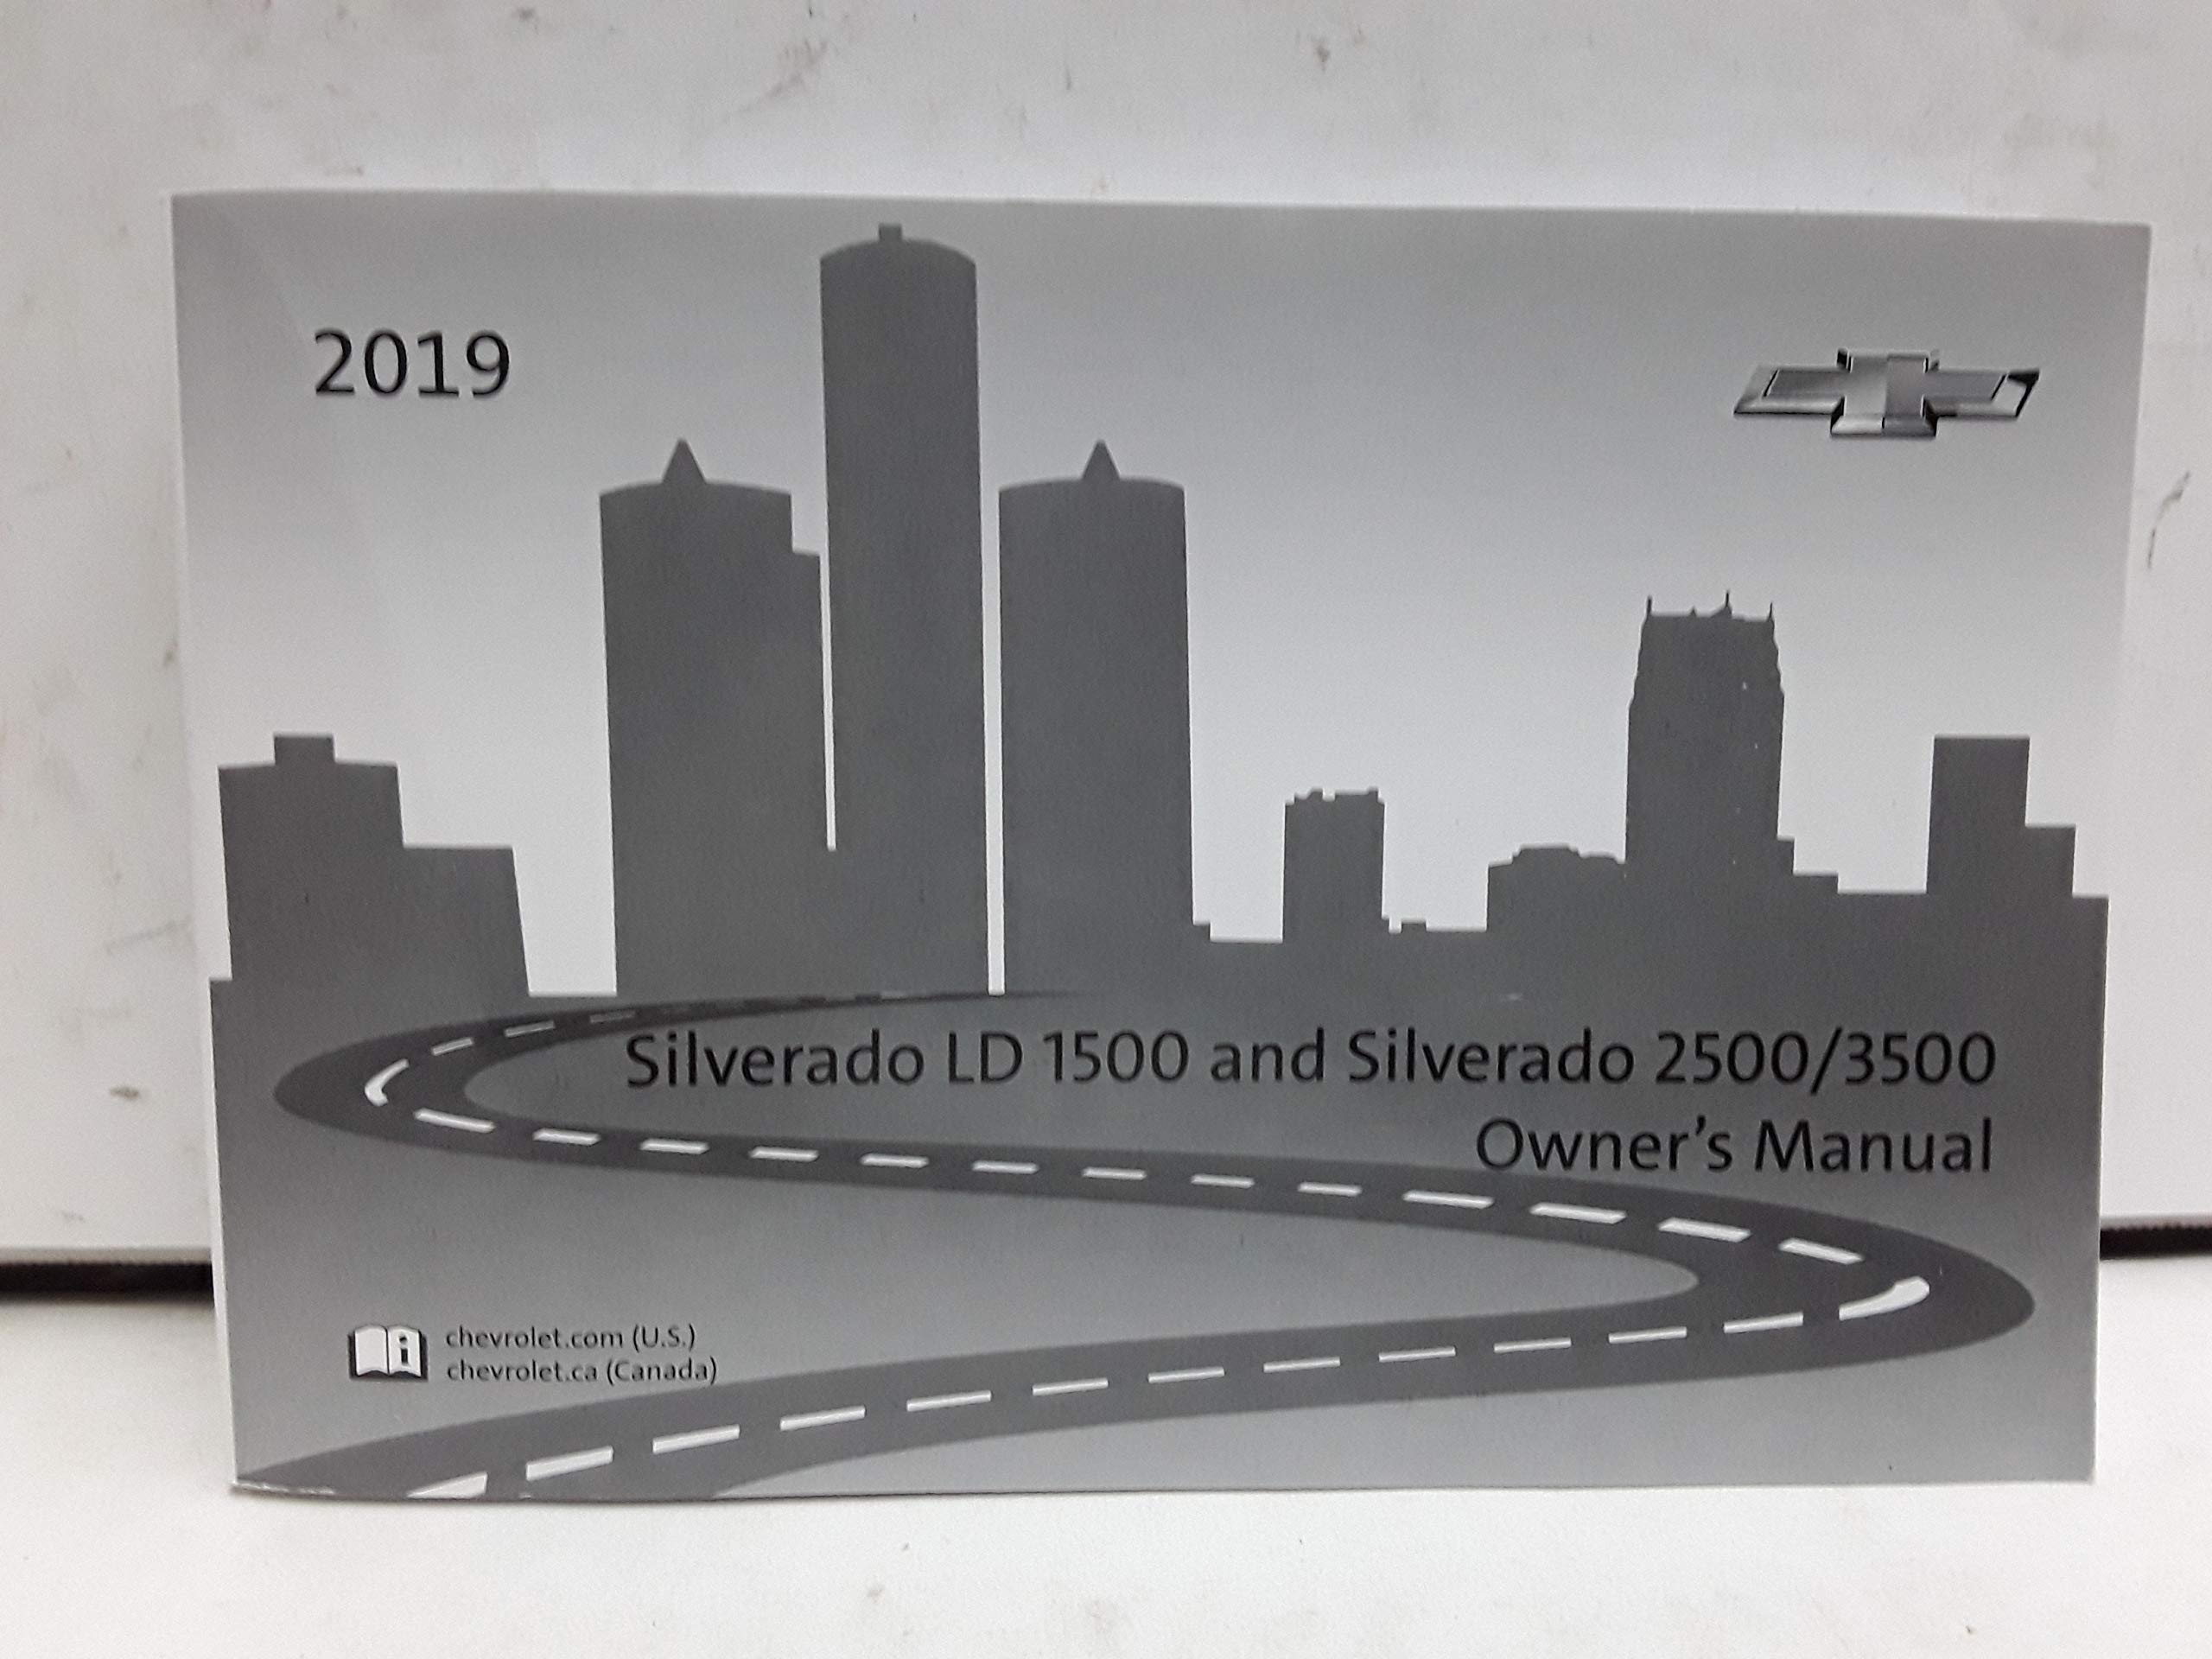 2019 Chevrolet Silverado Owners Manual Chevrolet Cars